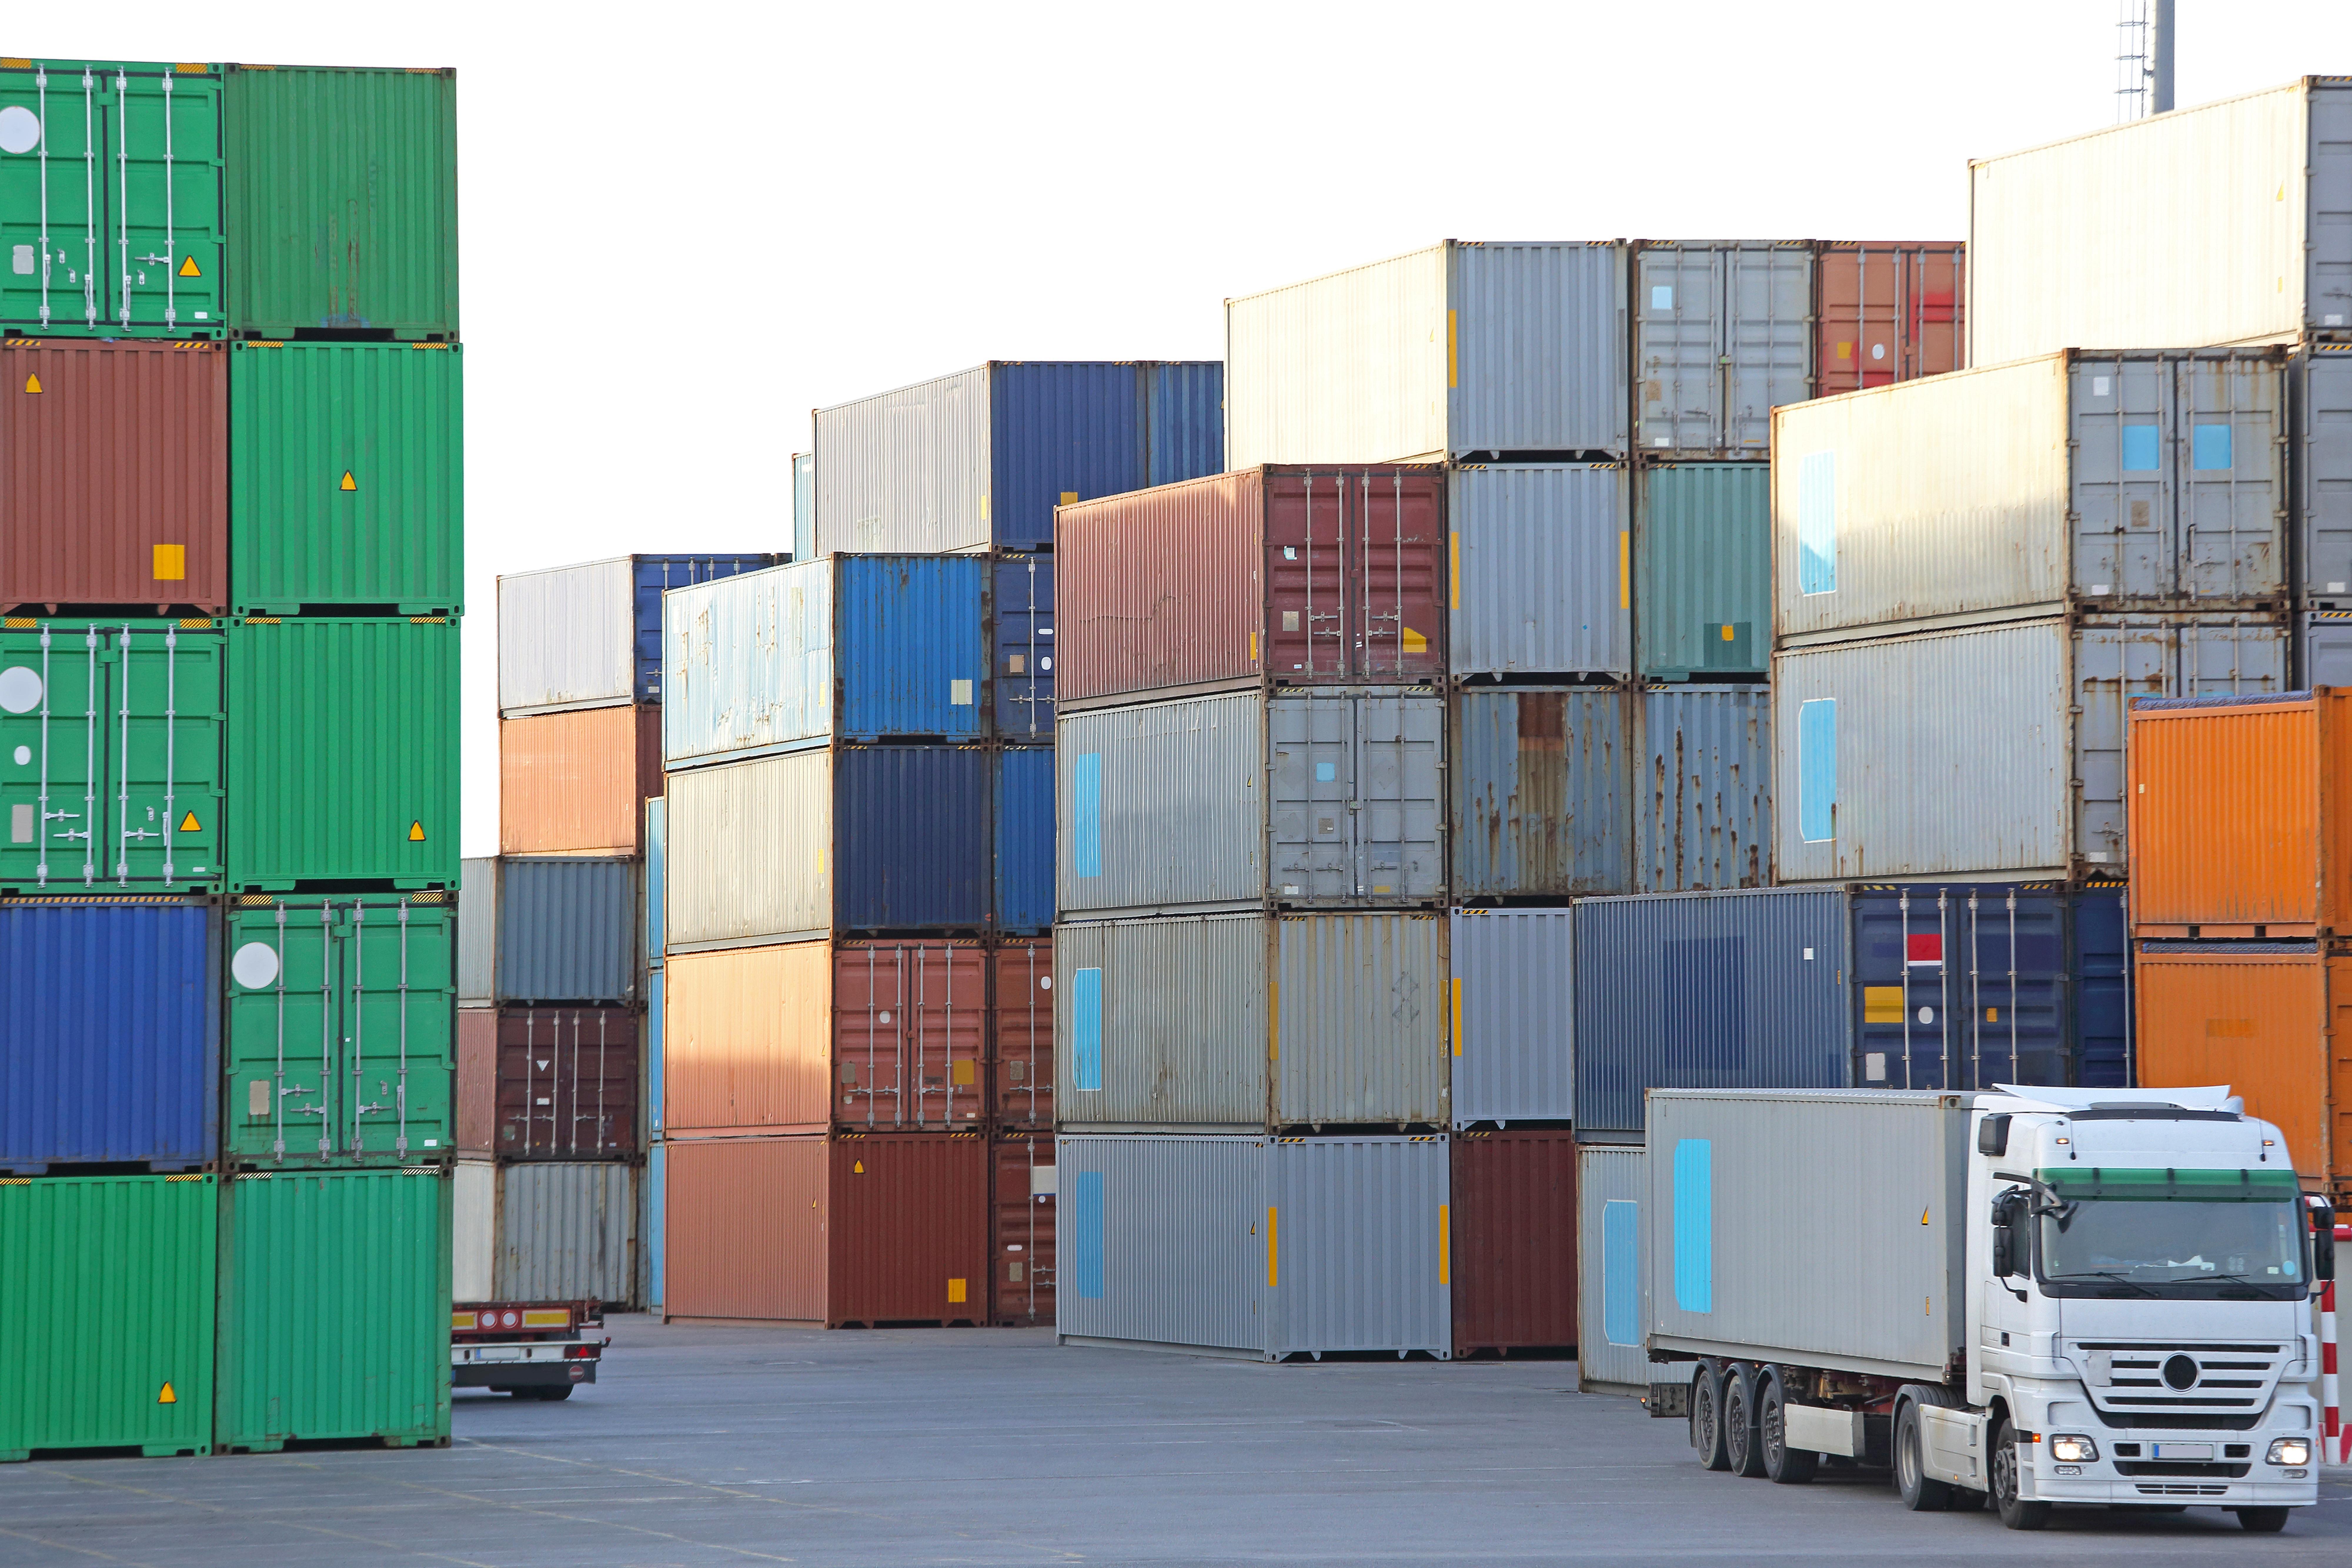 Truck at shipping yard